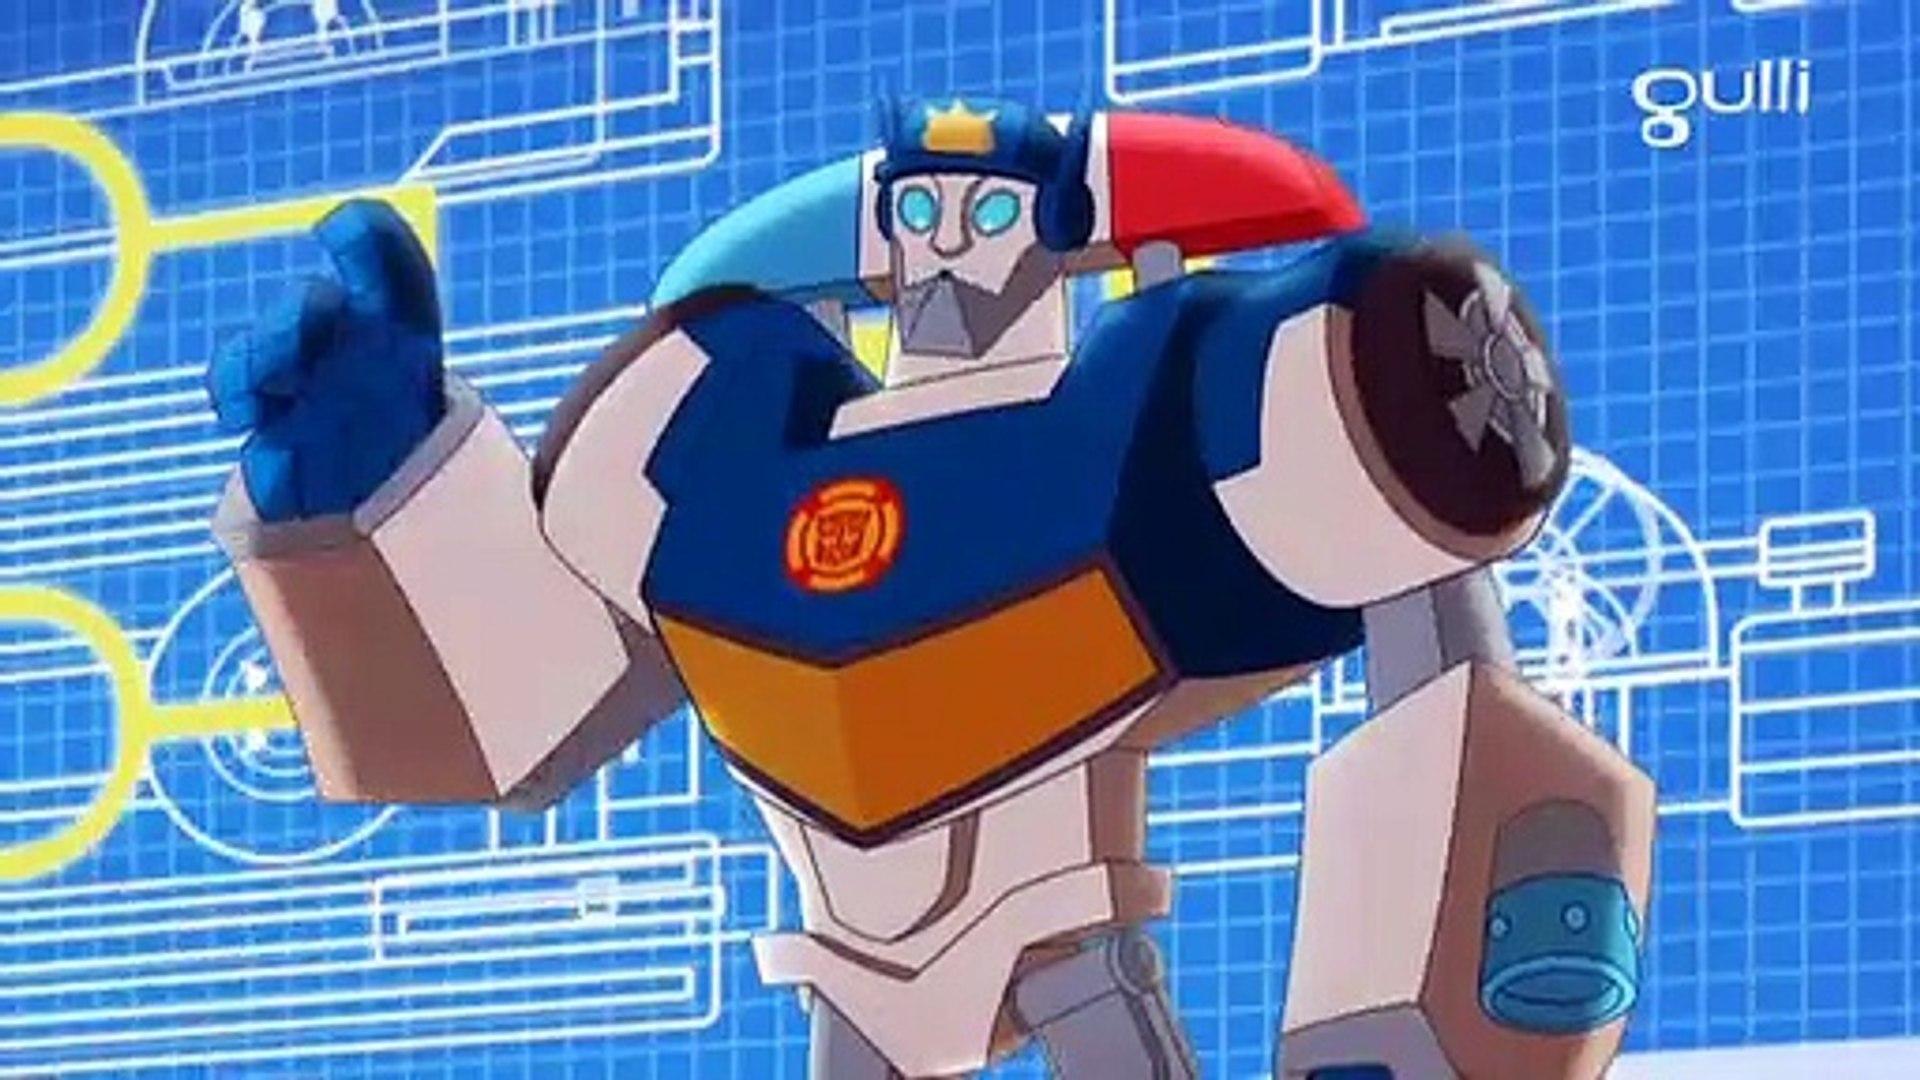 Transformers Rescue Bots Academy - Saison 1, Episode 50  Transformers Rescue Bots Academy